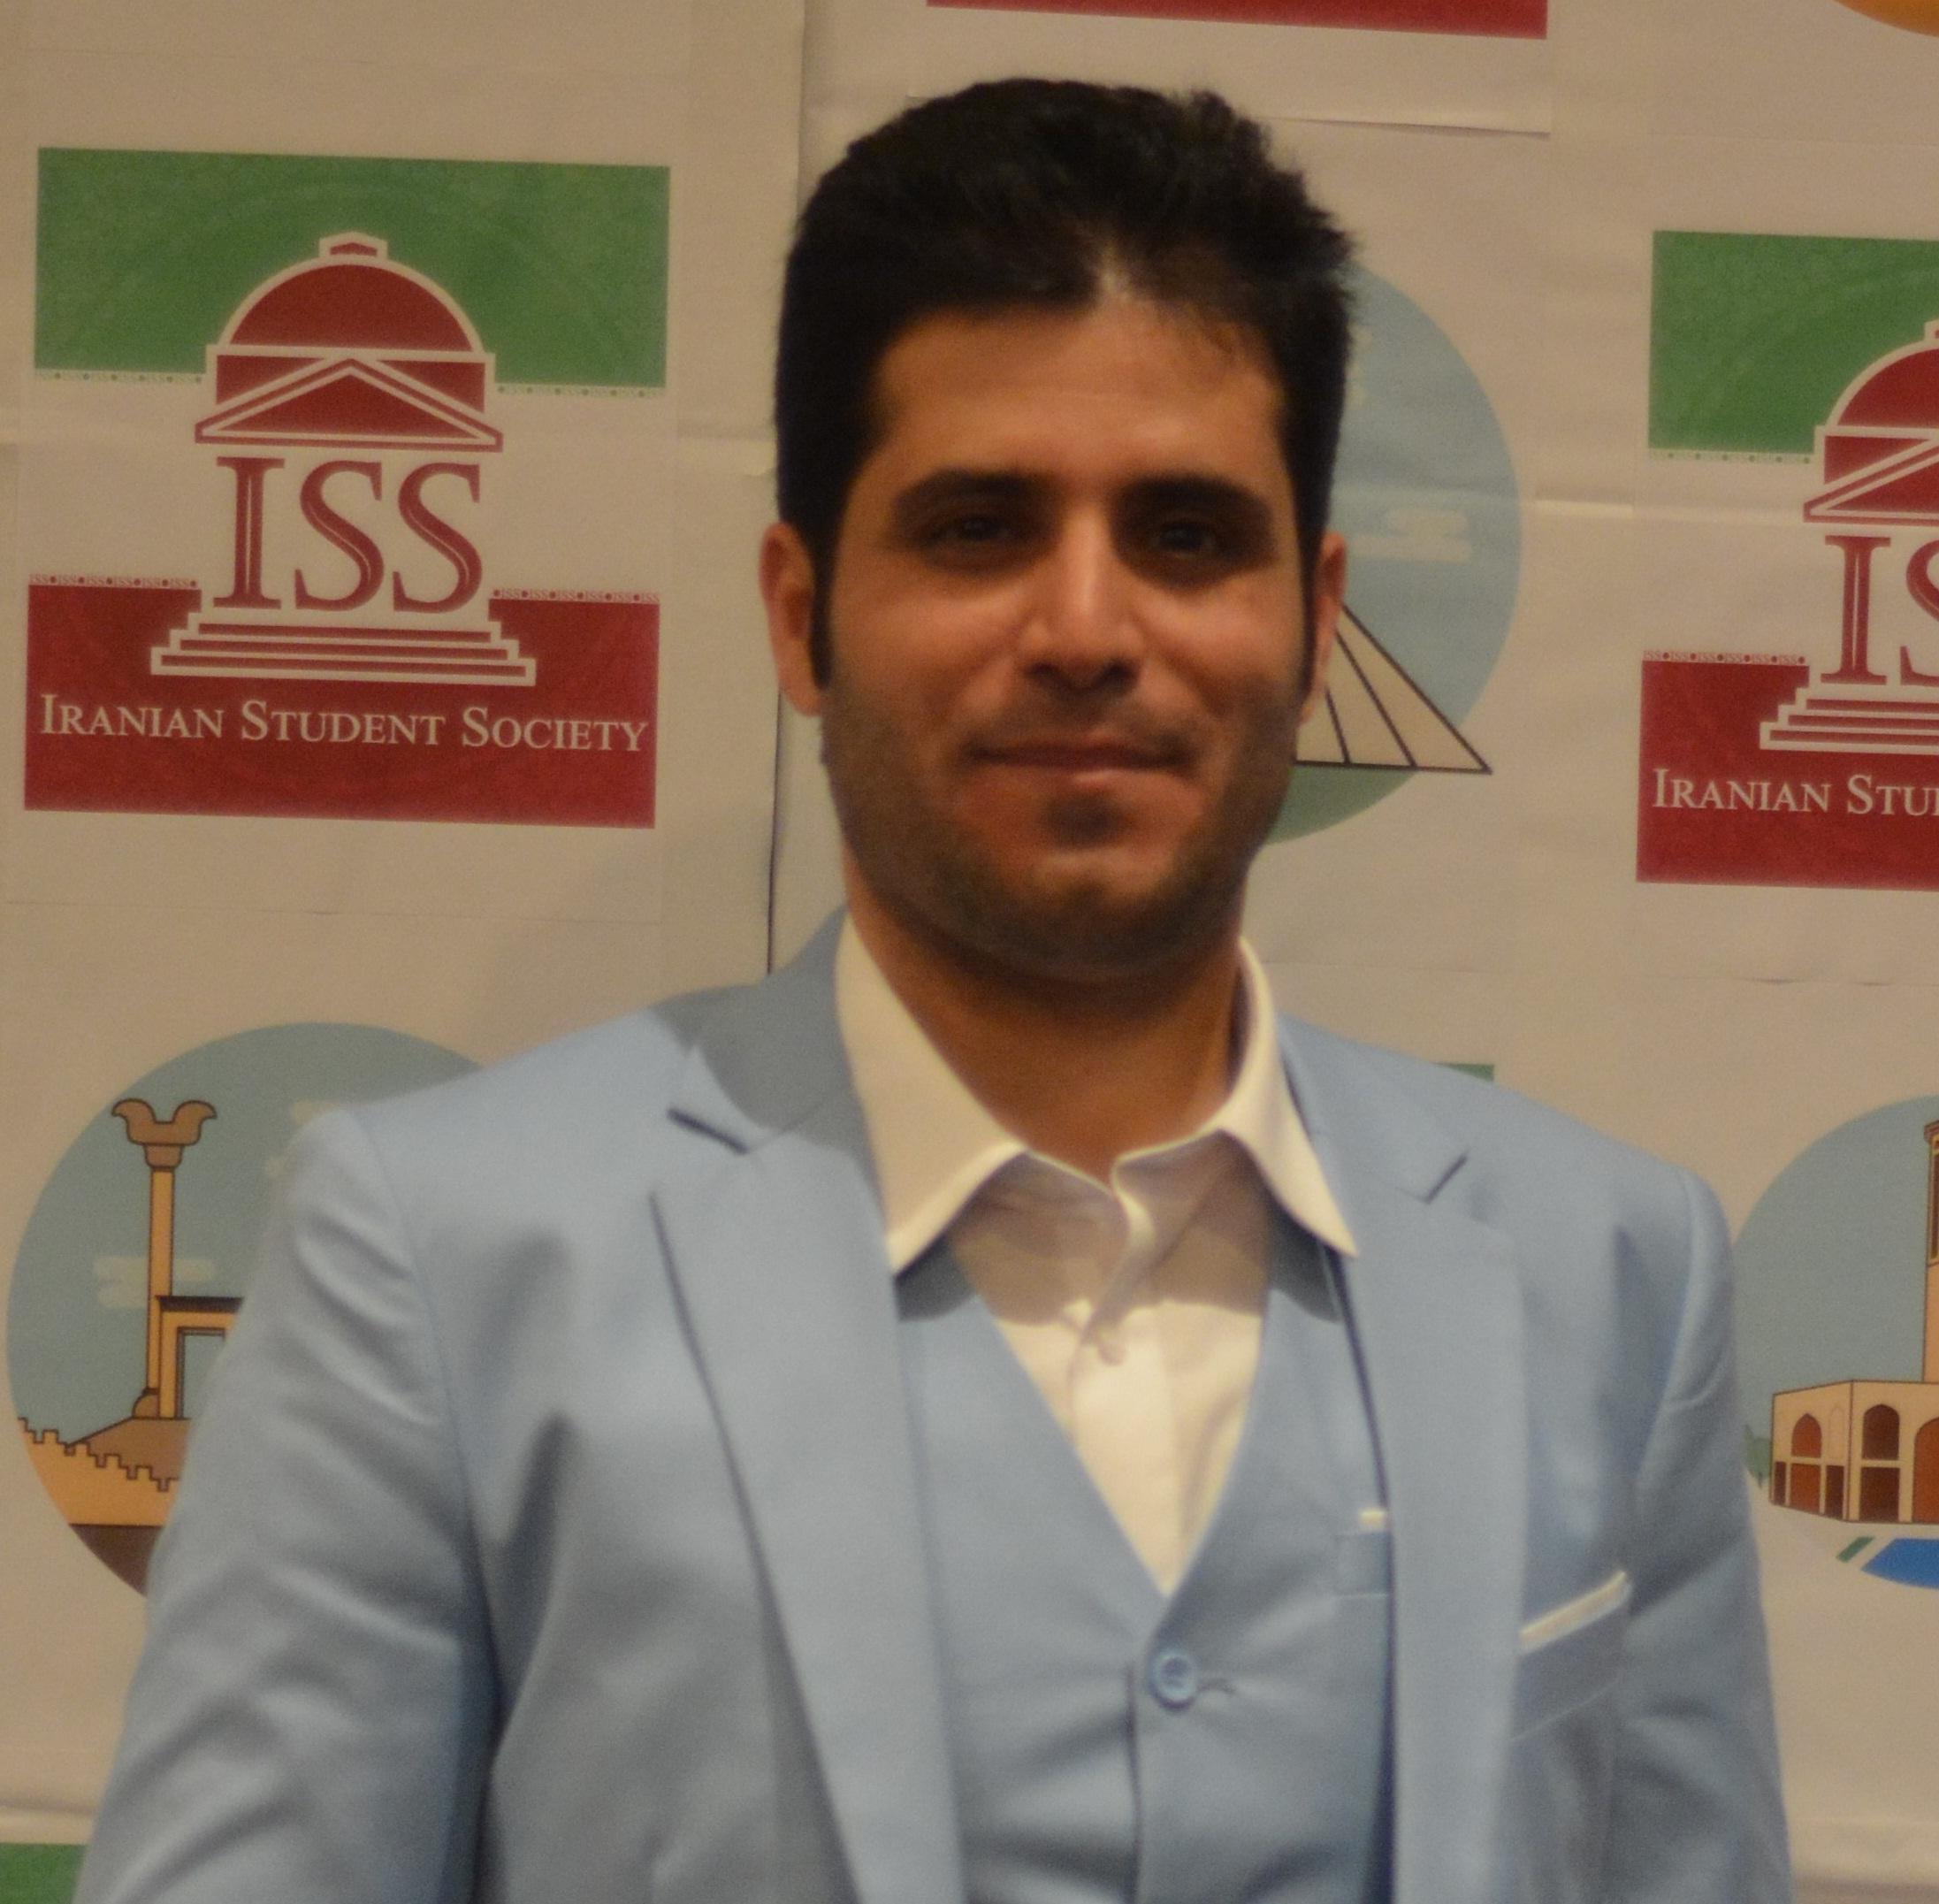 Dr. Vahid Jabbari, Ph.D.